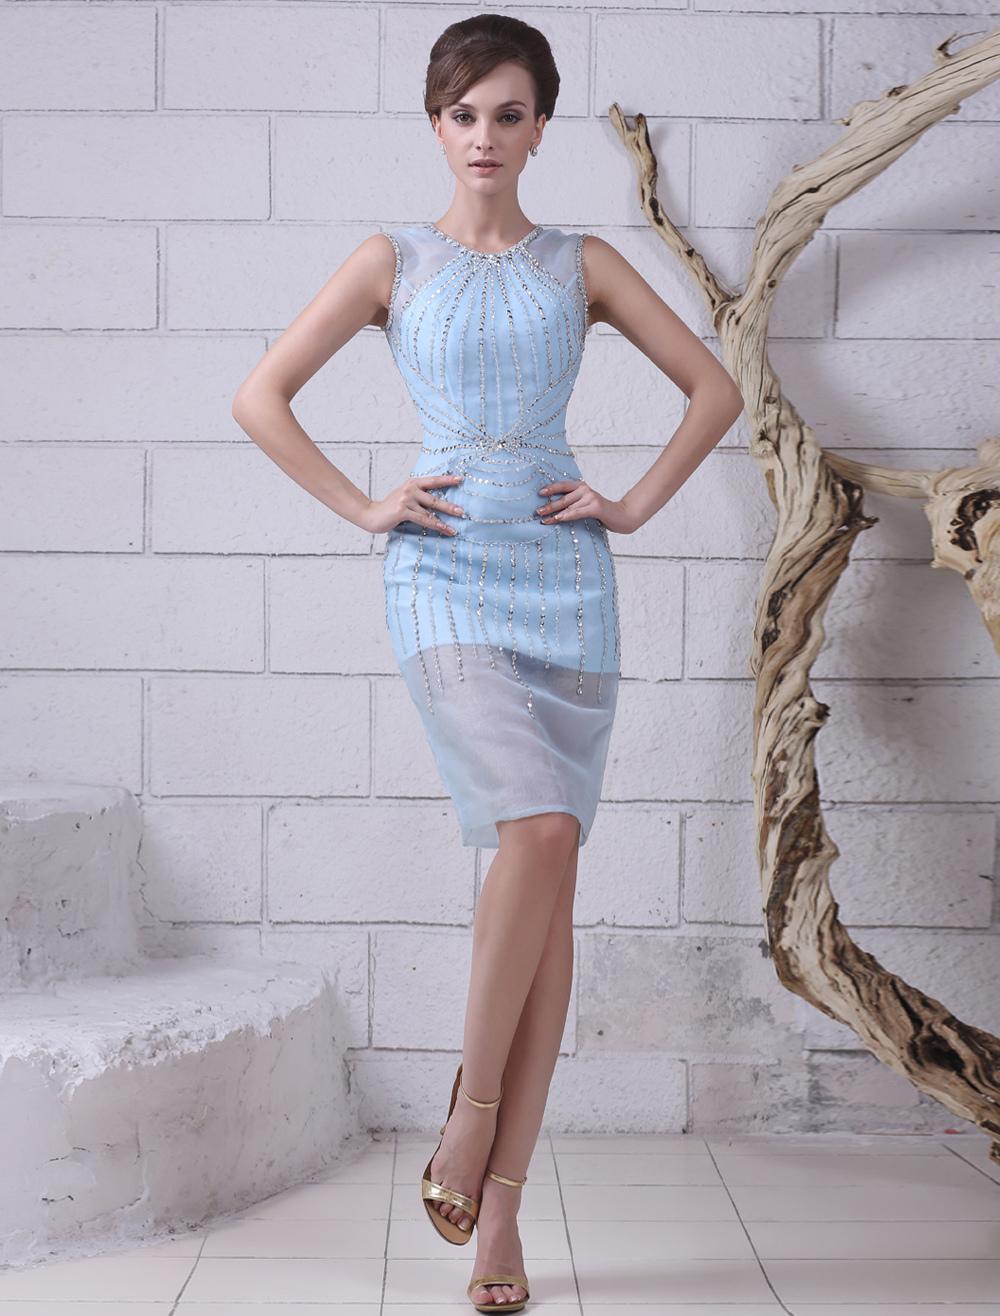 Buy Light Sky Blue Sheath Beading Jewel Neck Organza Cocktail Dress Wedding Guest Dress Milanoo for $153.30 in Milanoo store